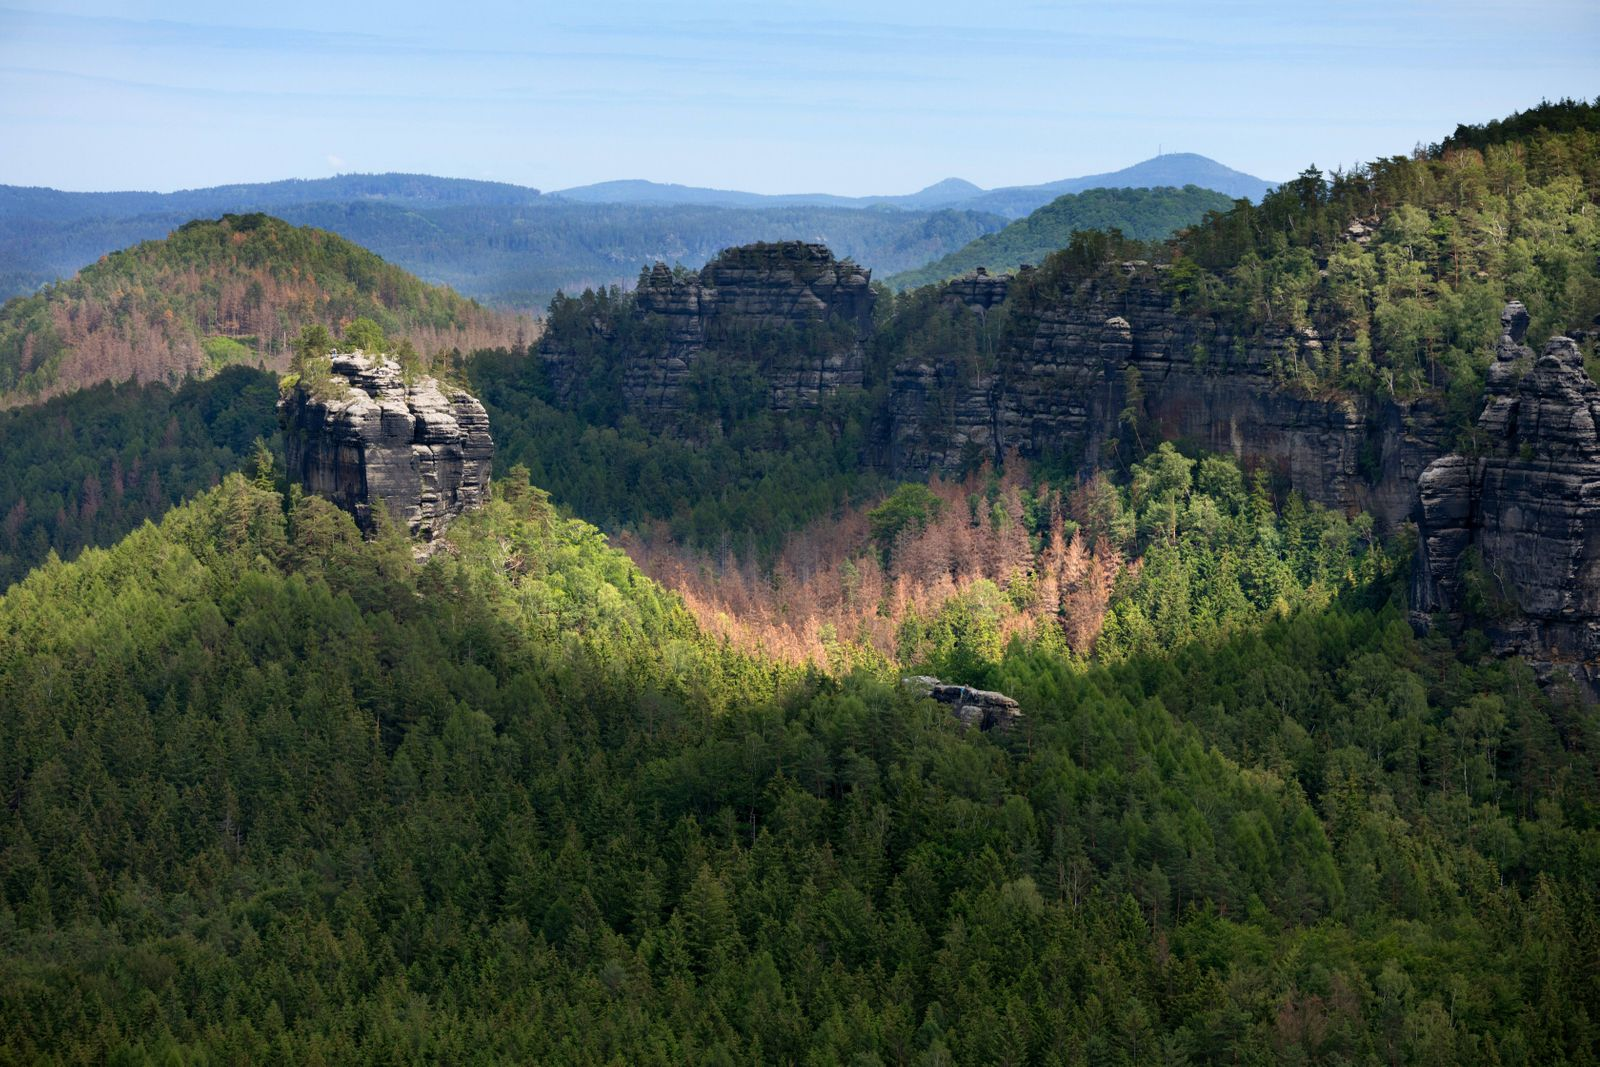 Europa Deutschland Sachsen Elbsandsteingebirge sächsische Schweiz Abgestorbenen Nadelwald in de